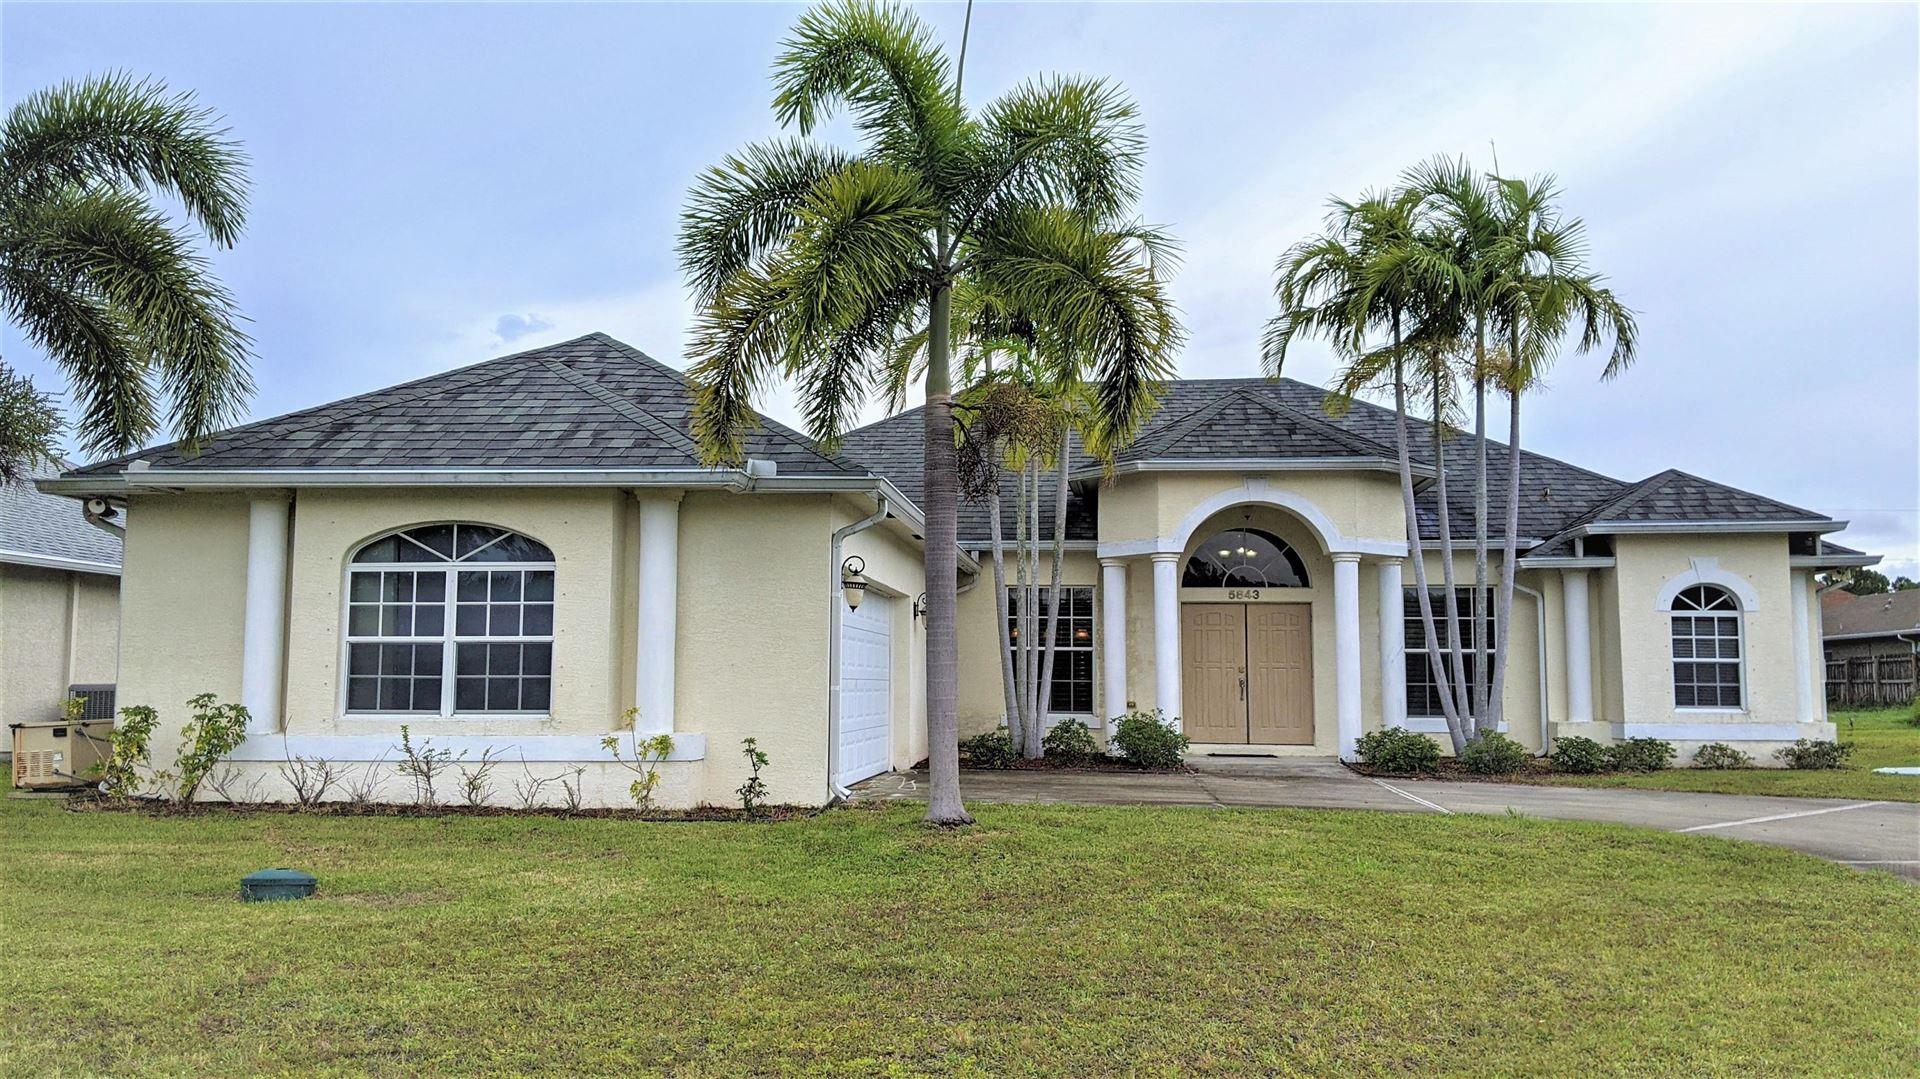 5843 NW Begonia Avenue, Port Saint Lucie, FL 34986 - MLS#: RX-10721569